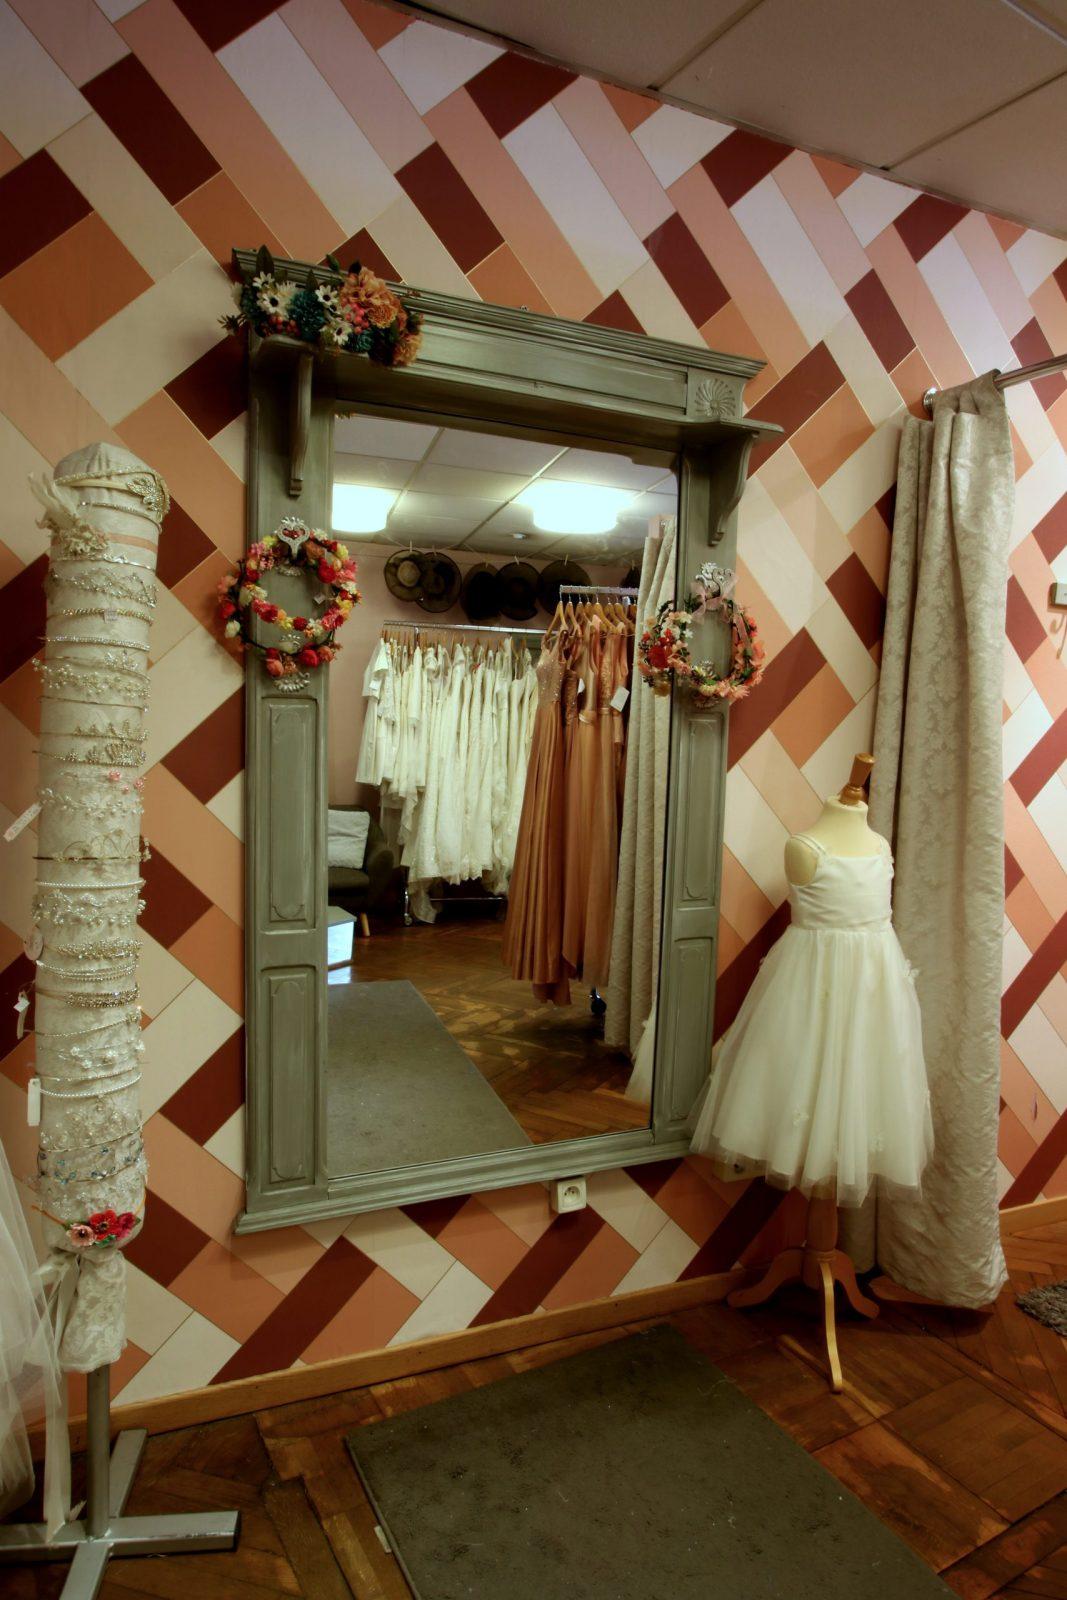 Robe de Coeur - Robe de soirée - robe de cérémonie- robe de demoiselle d'honneur - Albi - Tarn - Robe de mariée- accessoire - boutique cosy- cocooning- magasin robe de mariee